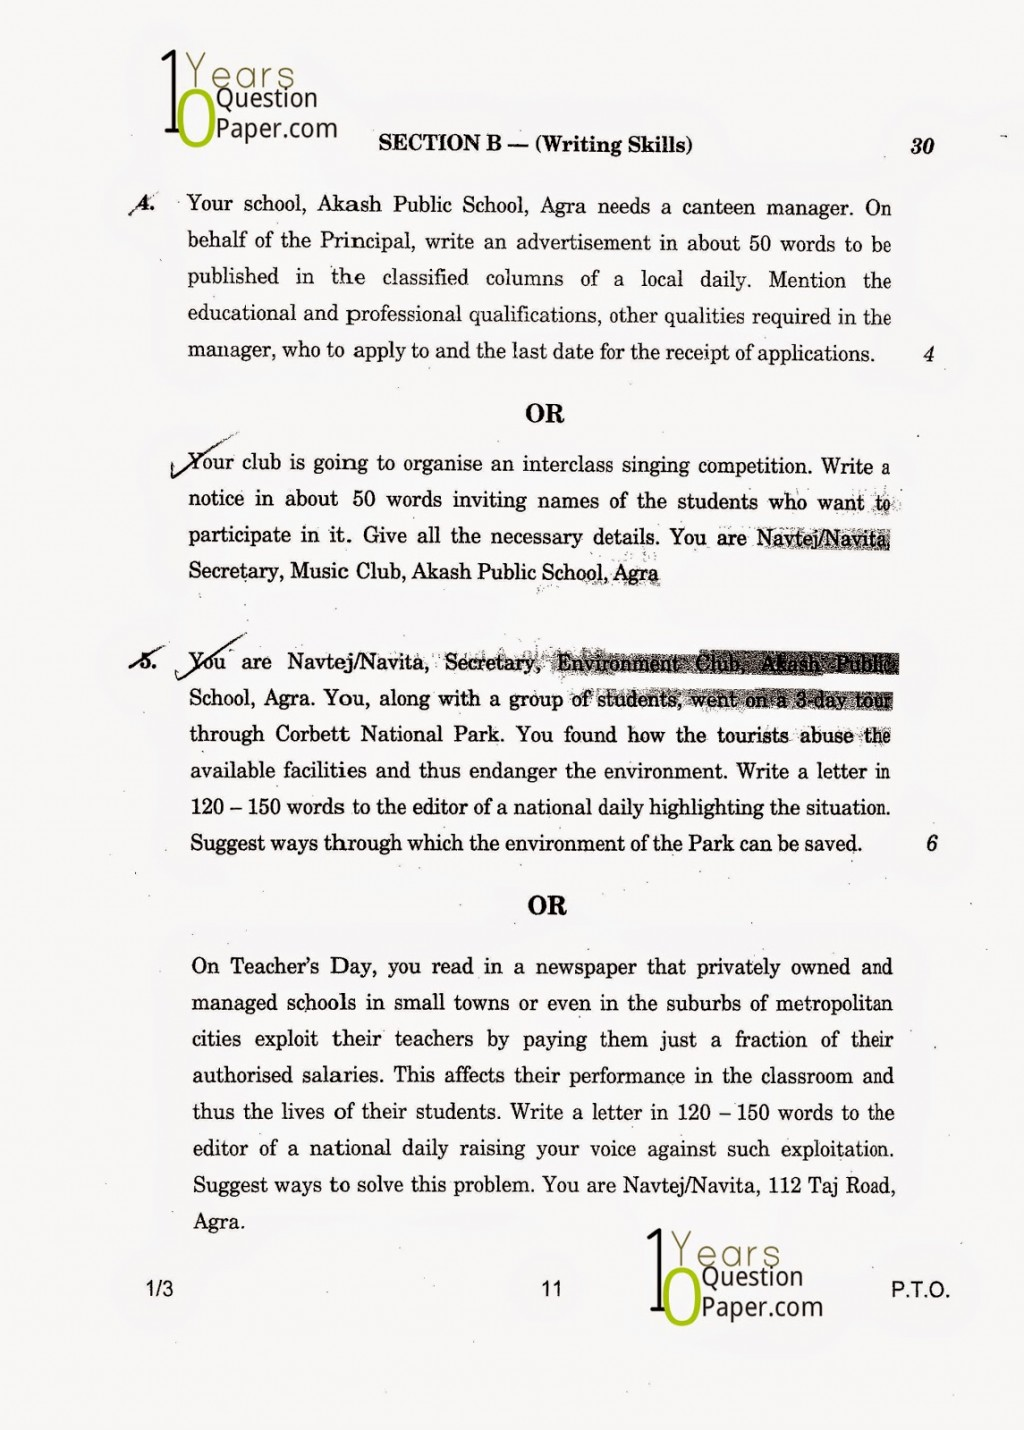 010 Essay Example English Topics Cbse Set Dreaded Literature Question Paper For Class 10 Icse 2015 Maharashtra Board Large